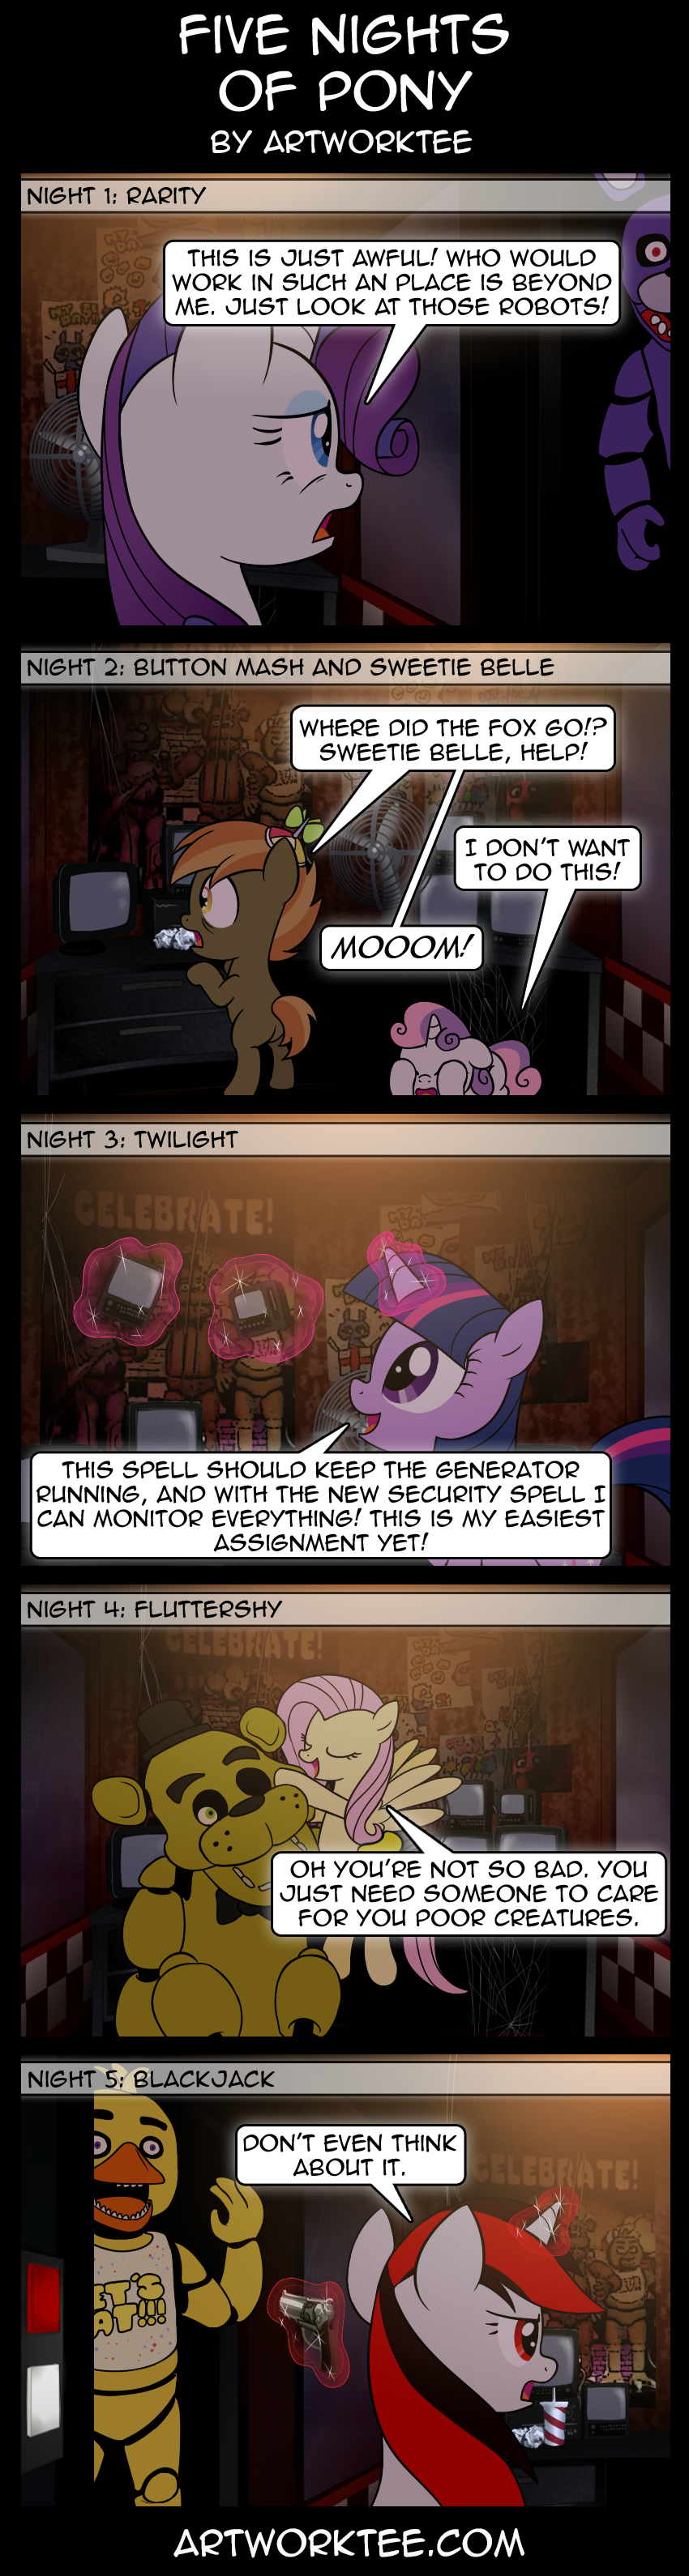 Five Nights Of Pony